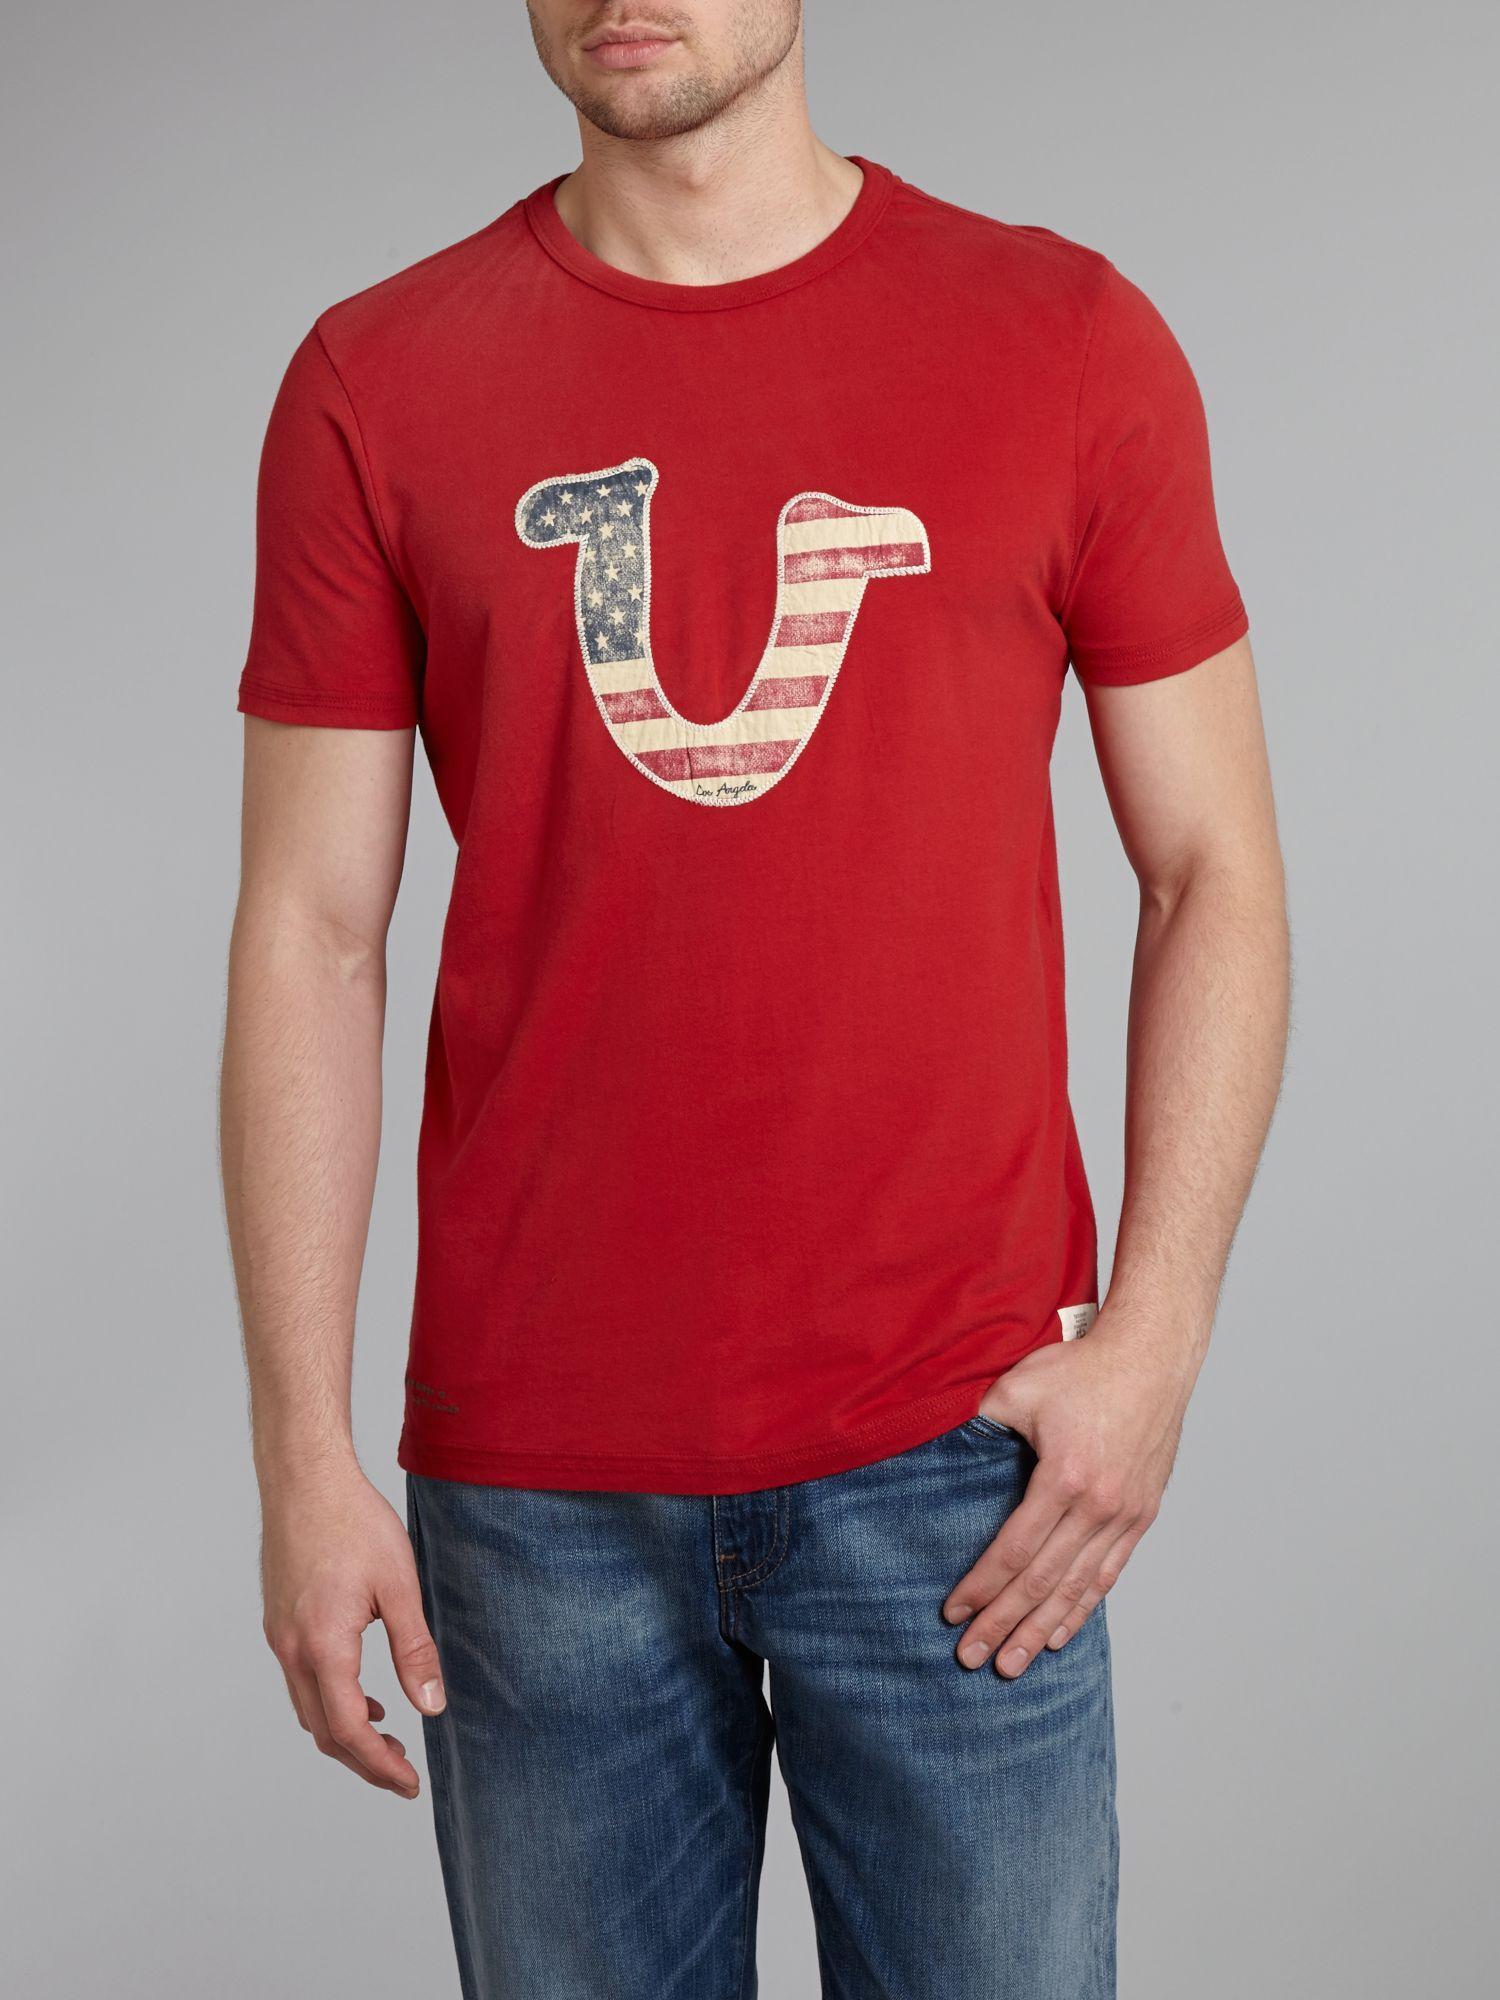 True Religion Us Logo Tshirt in Red for Men